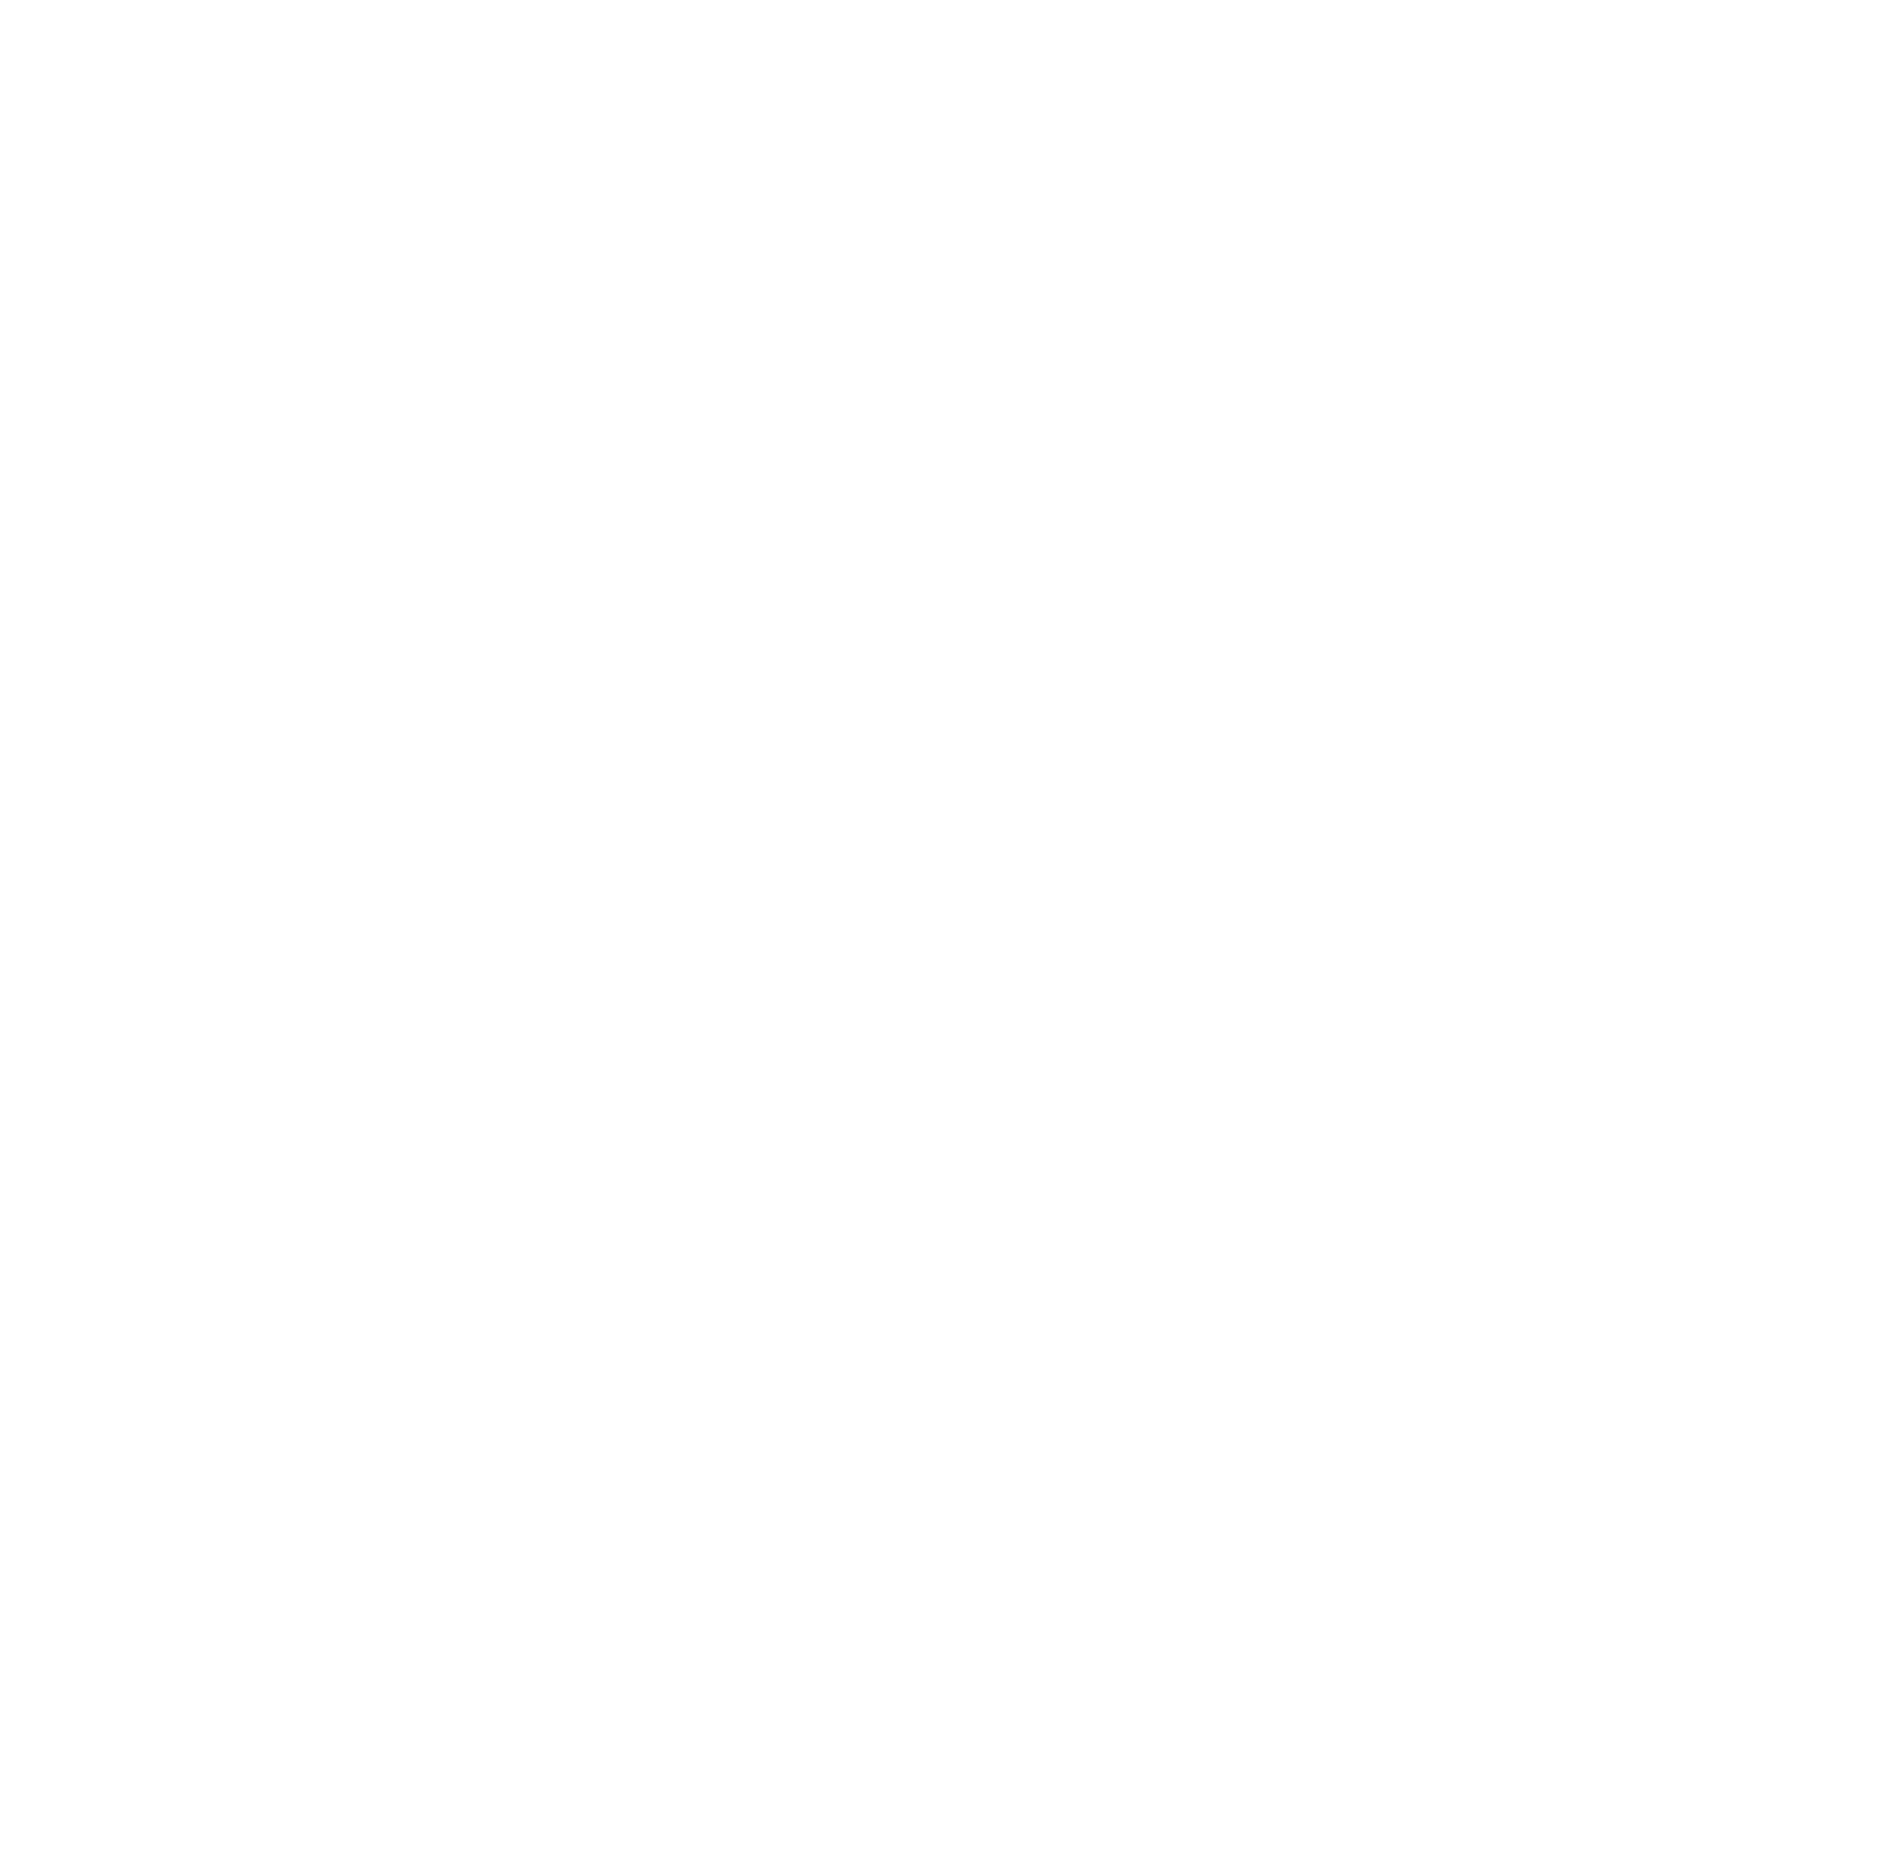 Gio Media